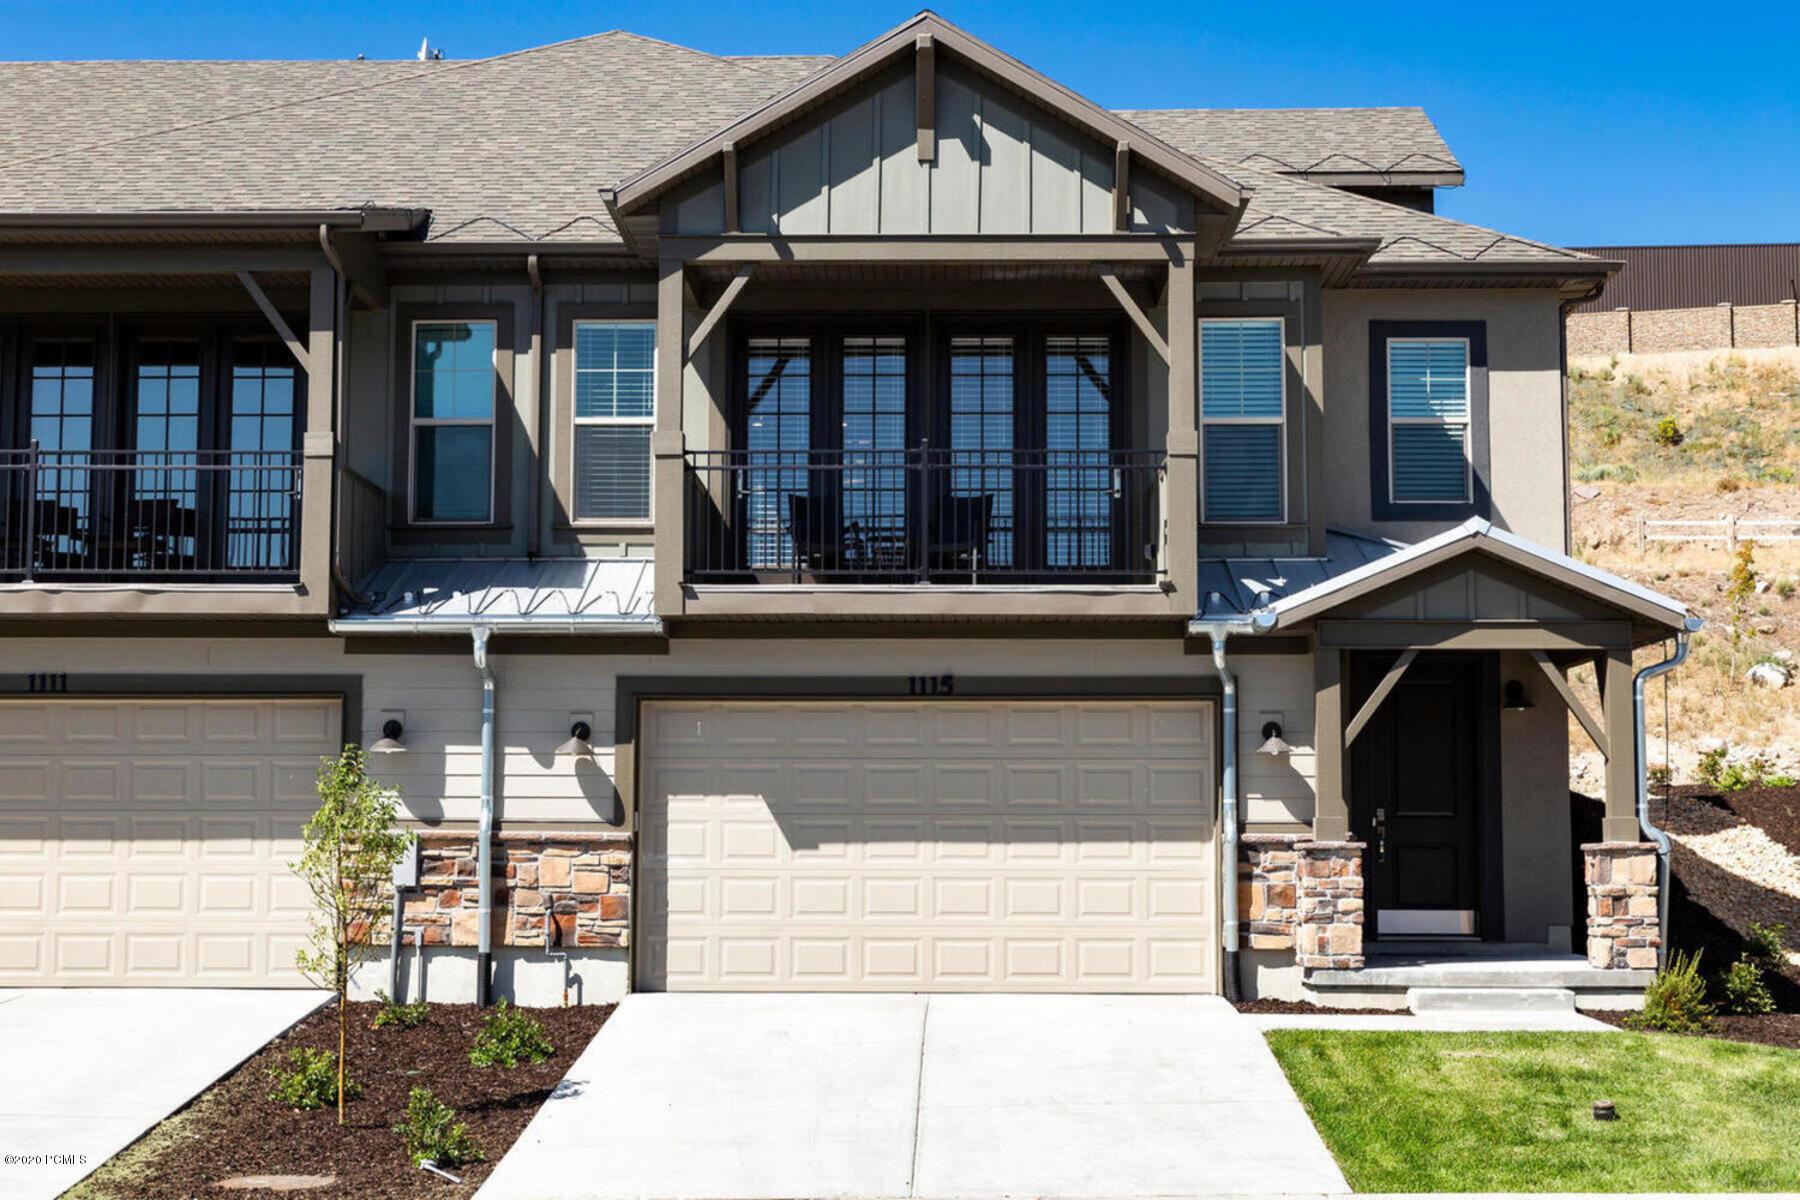 1053 Wasatch Springs Road, Heber City, Utah 84032, 4 Bedrooms Bedrooms, ,4 BathroomsBathrooms,Condominium,For Sale,Wasatch Springs,12003904